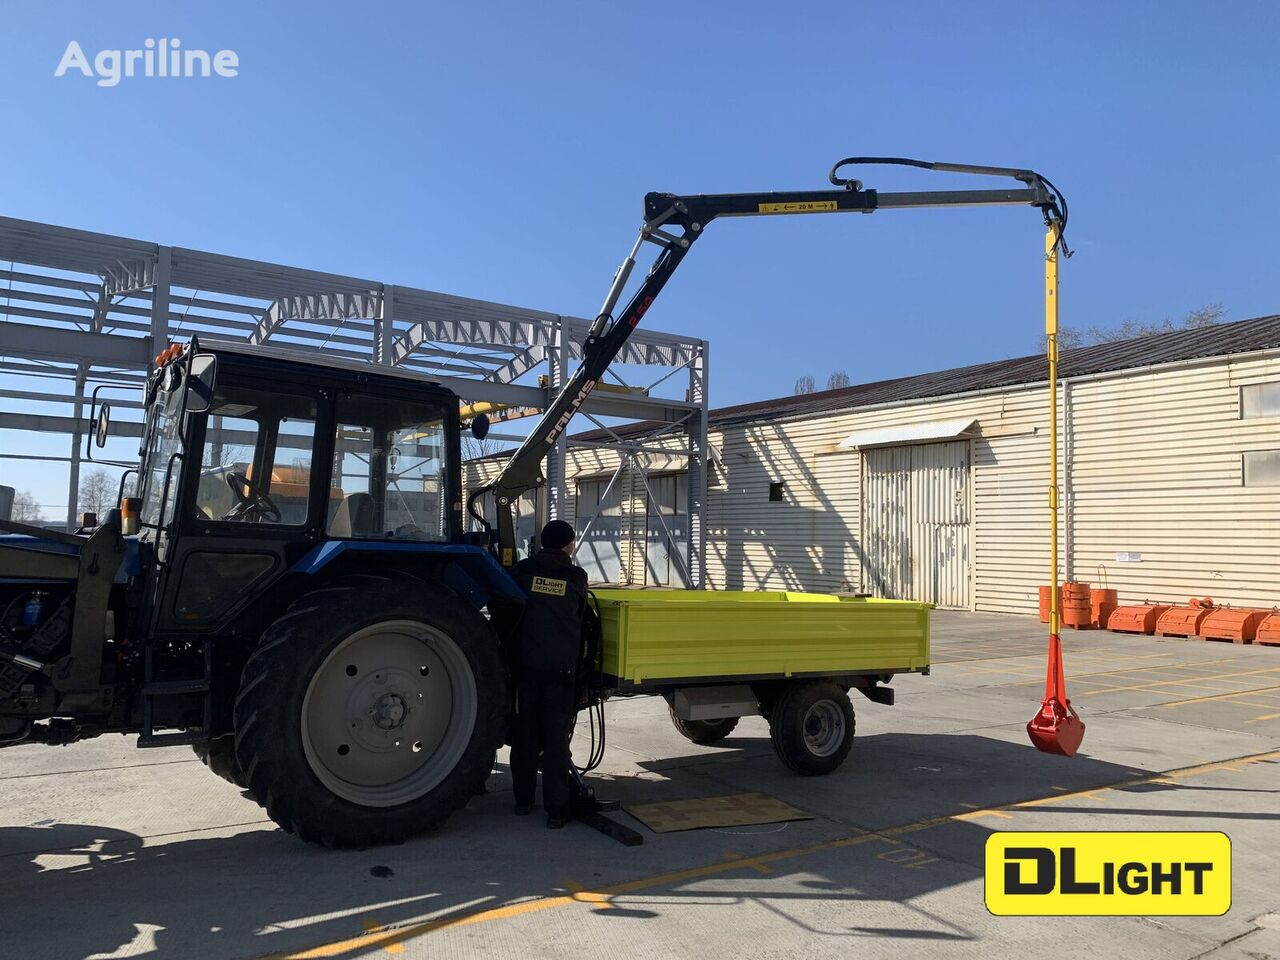 new DLight DL CityMaster tractor trailer